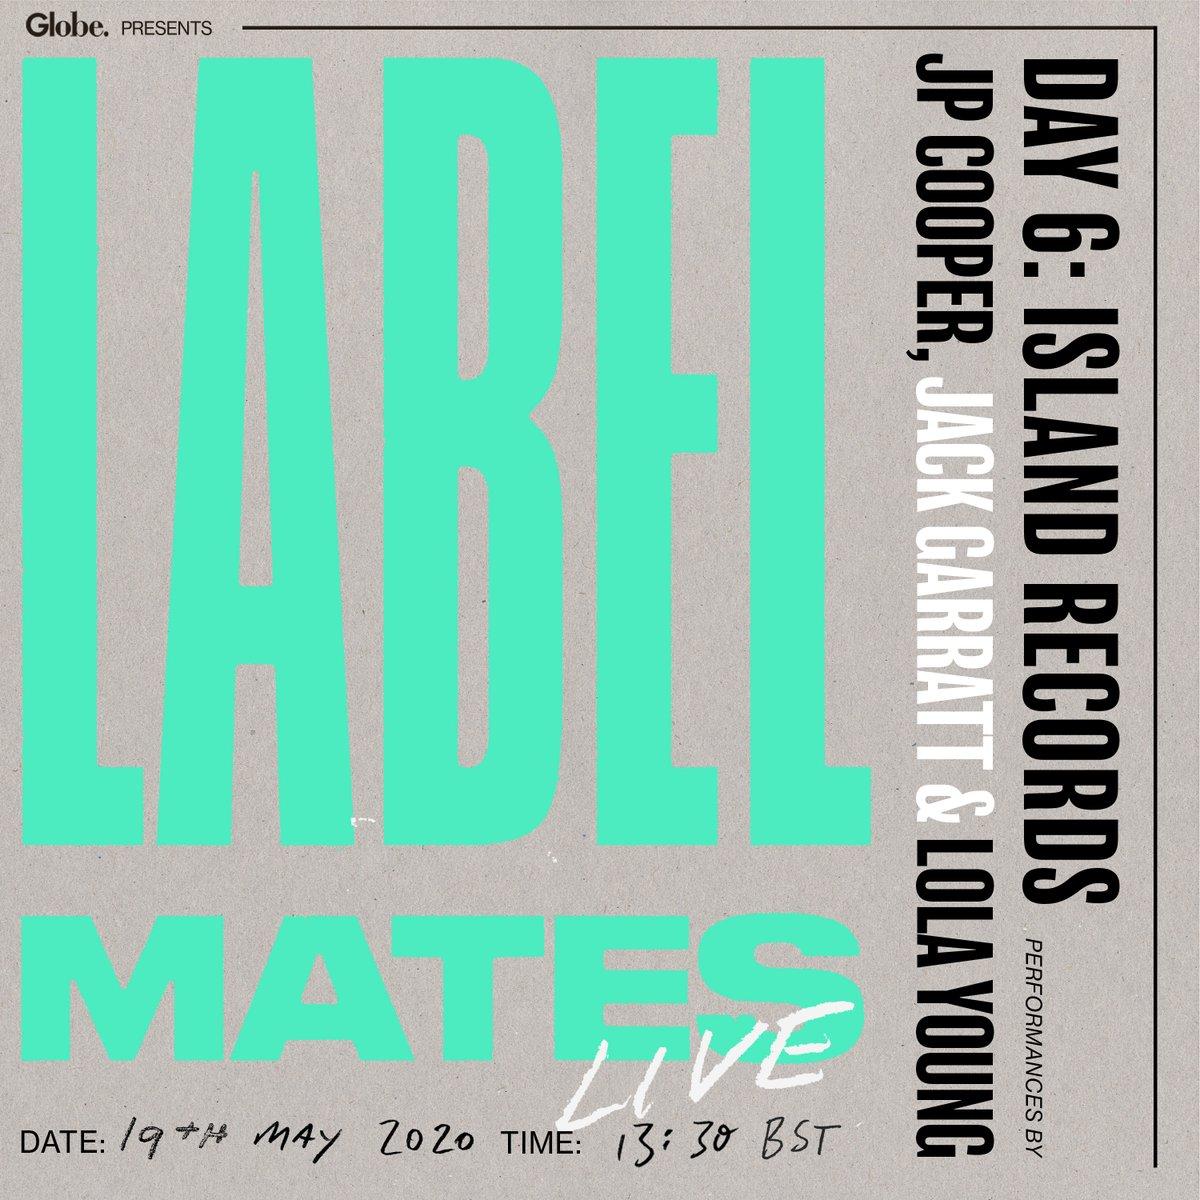 Day 6 of @UMusicGlobeUK's LabelMates is here 🎶Today we have @islandrecordsuk's @JPCooperMusic @JackGarratt & Lola Young 🎉 https://t.co/tg9OQXTt4p